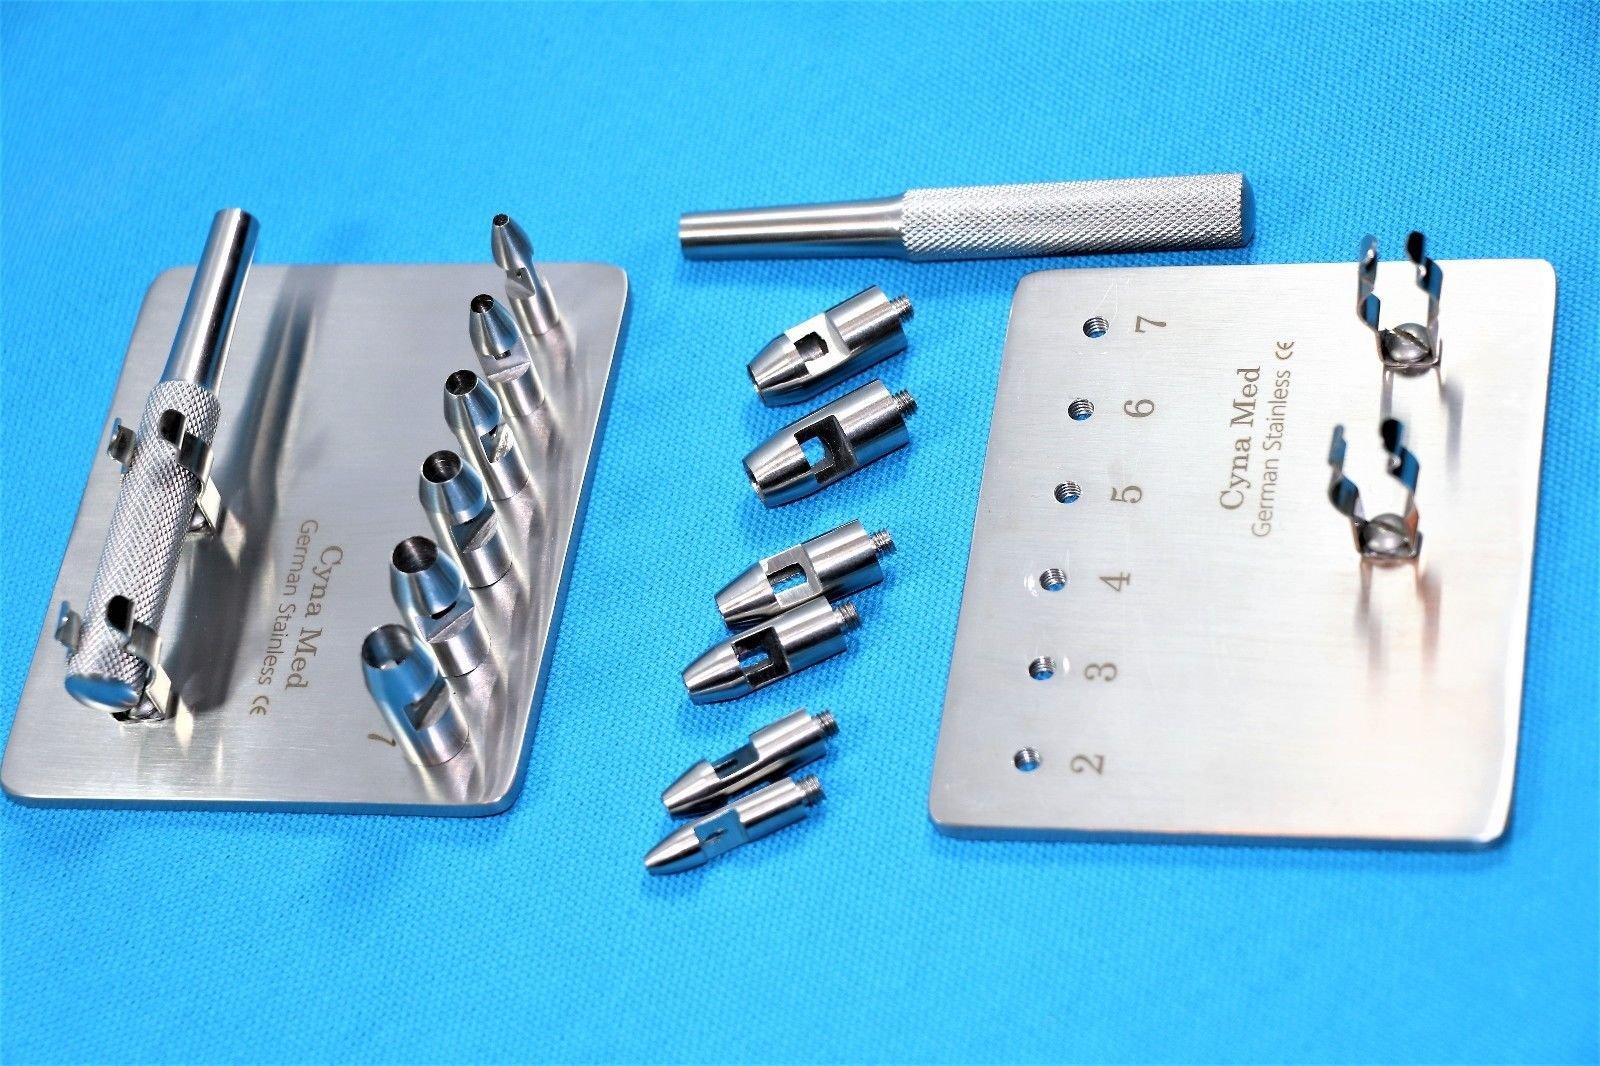 Premium German Keyes Dermal Punch Set of 6pcs 2mm-7mm Dermatology Surgical Instruments (CYNAMED)